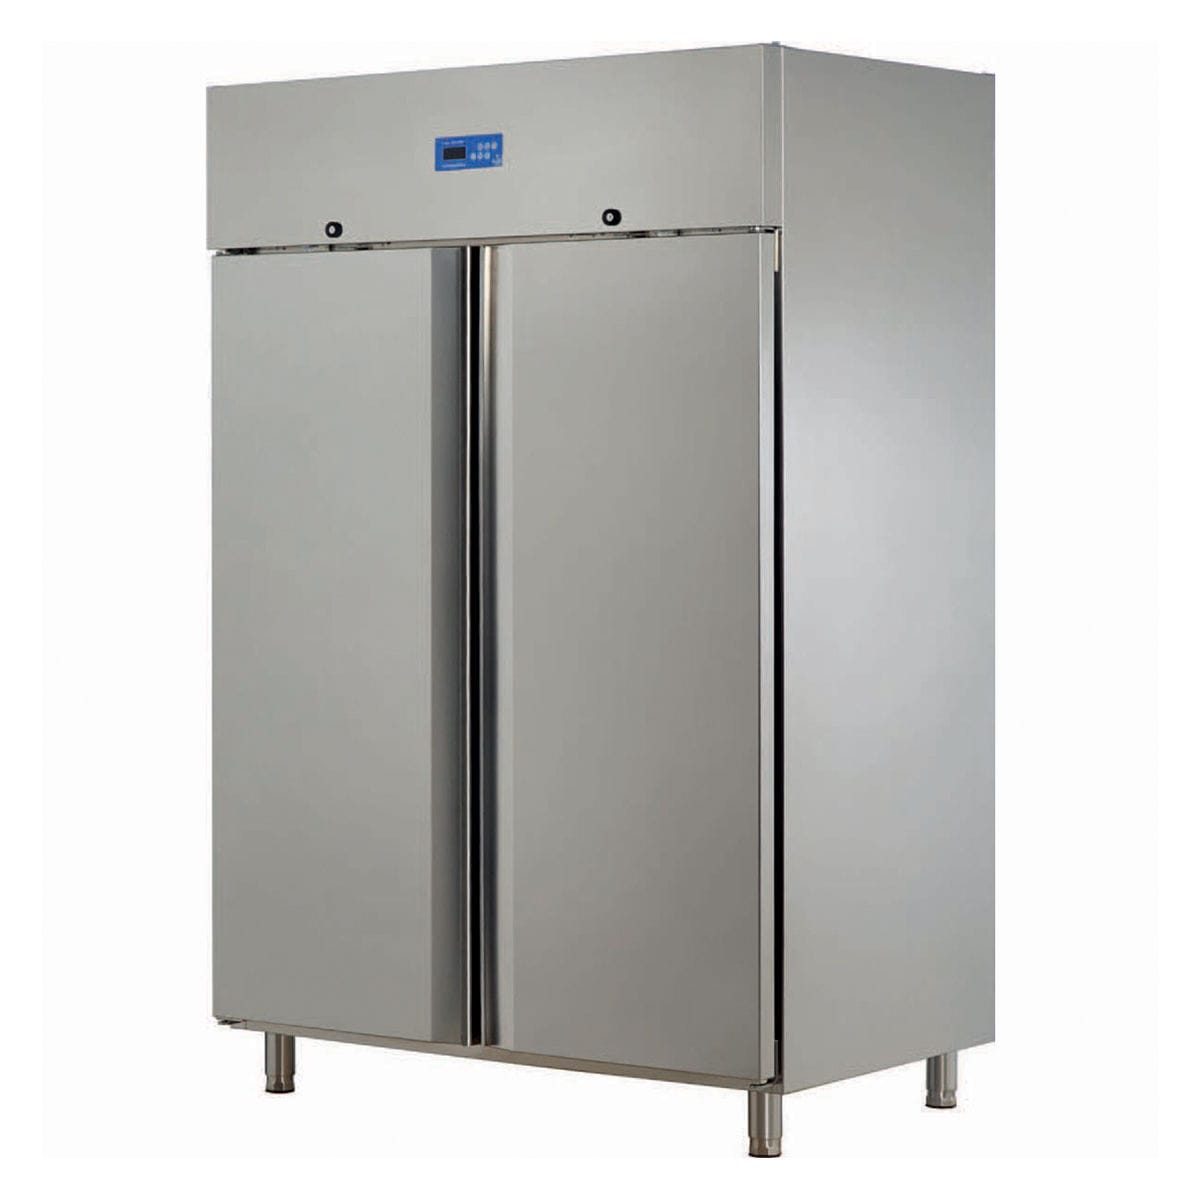 Commercial refrigerator / double door / stainless steel / glazed ...